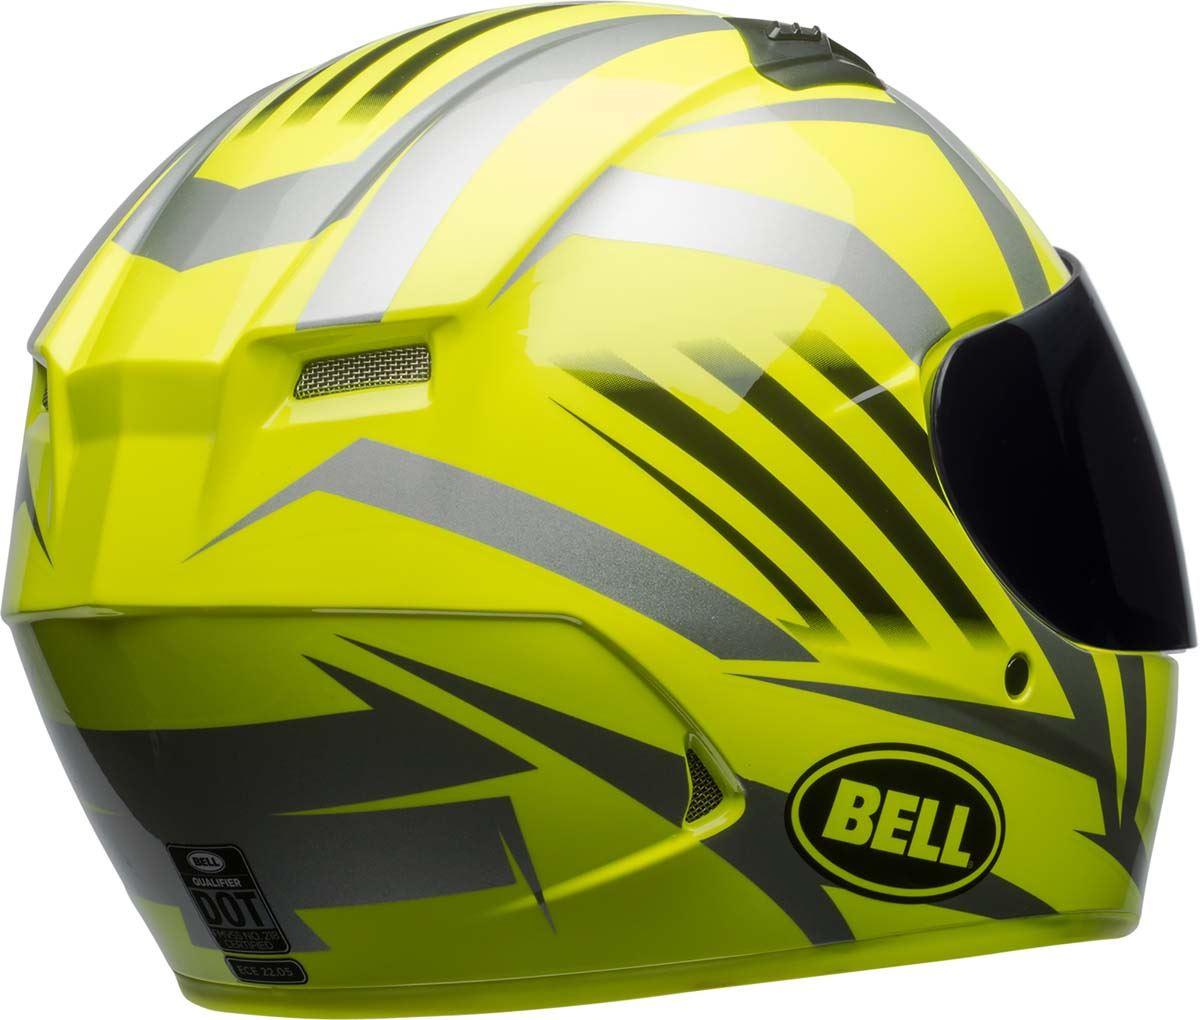 Bell-Qualifier-Helmet-Full-Face-Motorcycle-Clear-Shield-DOT-XS-3XL miniature 42